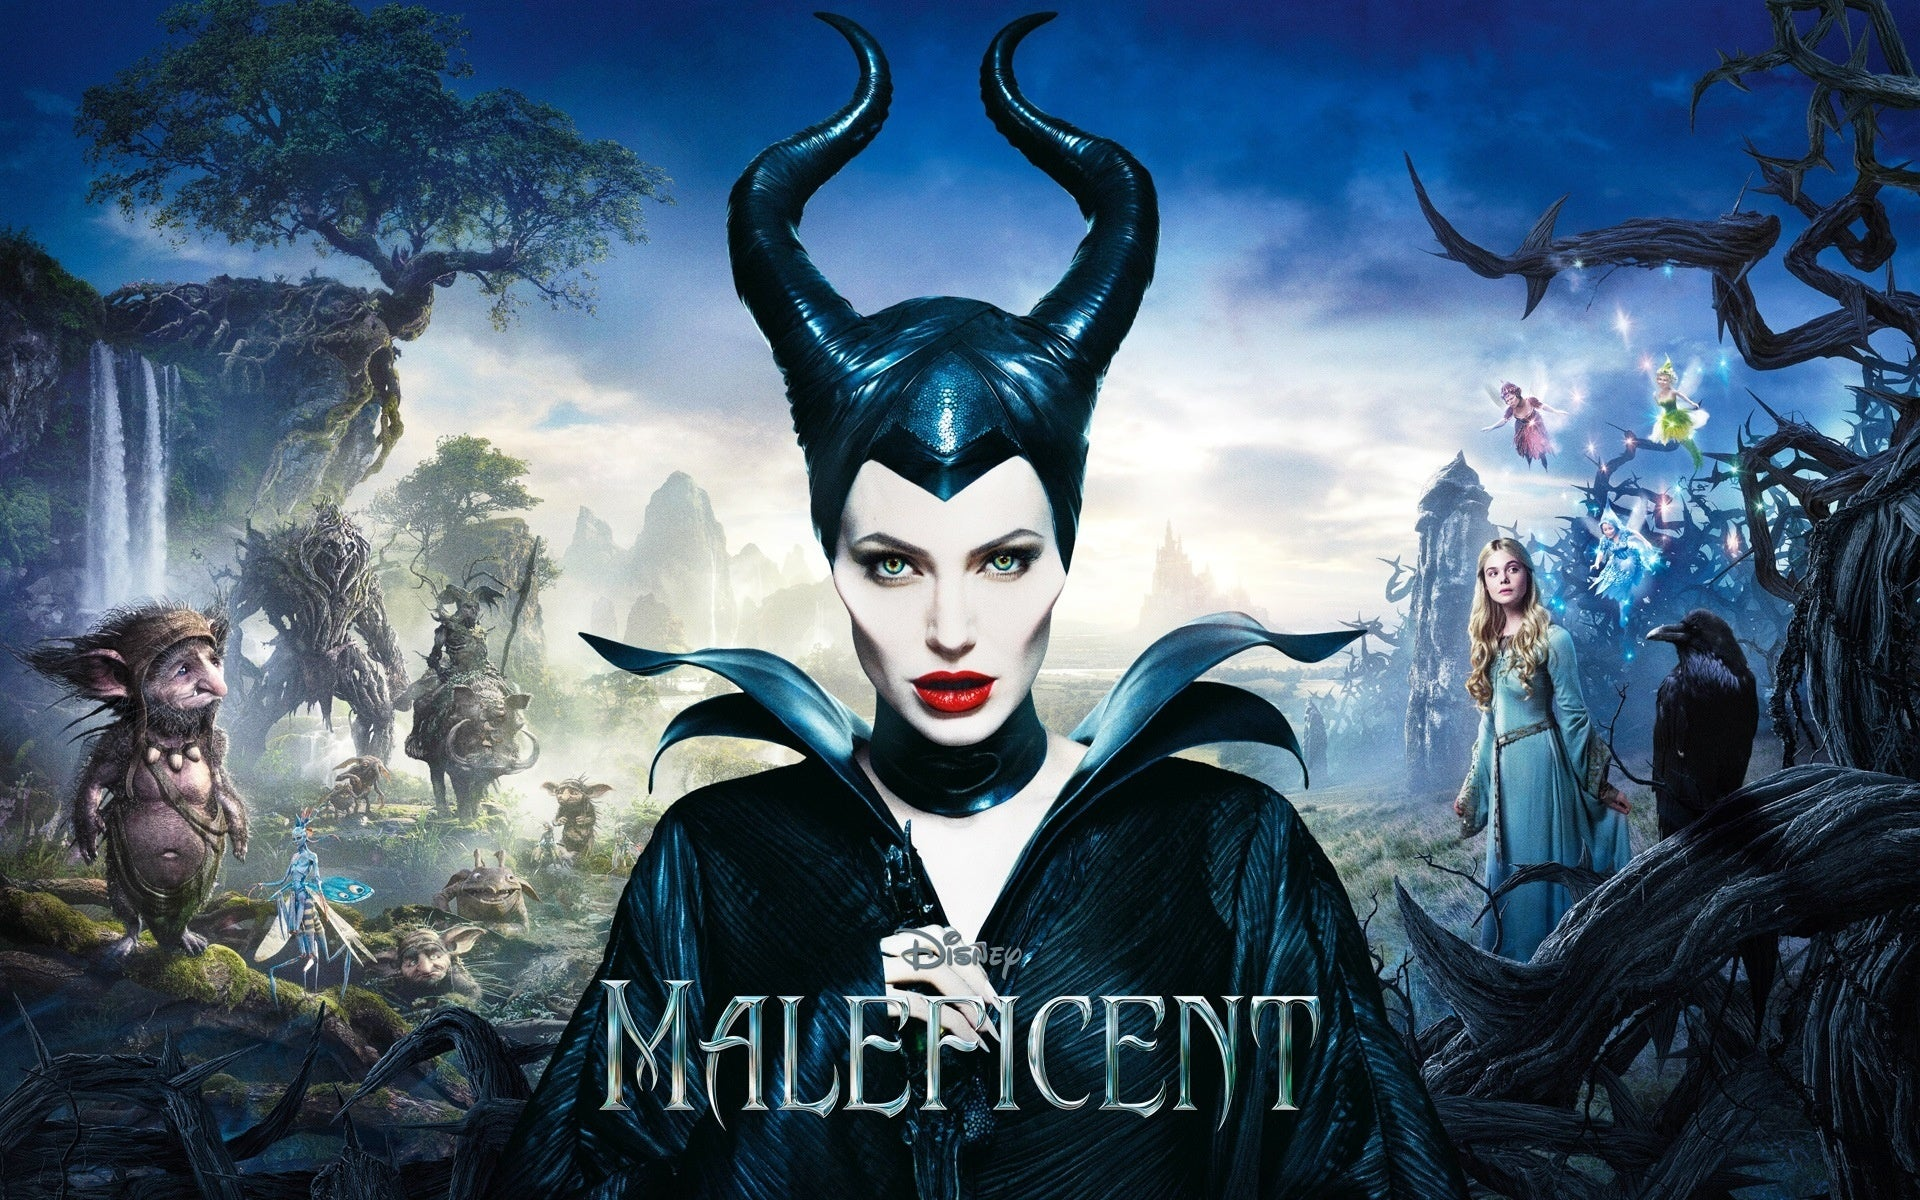 Maleficent Gets A Honest Trailer